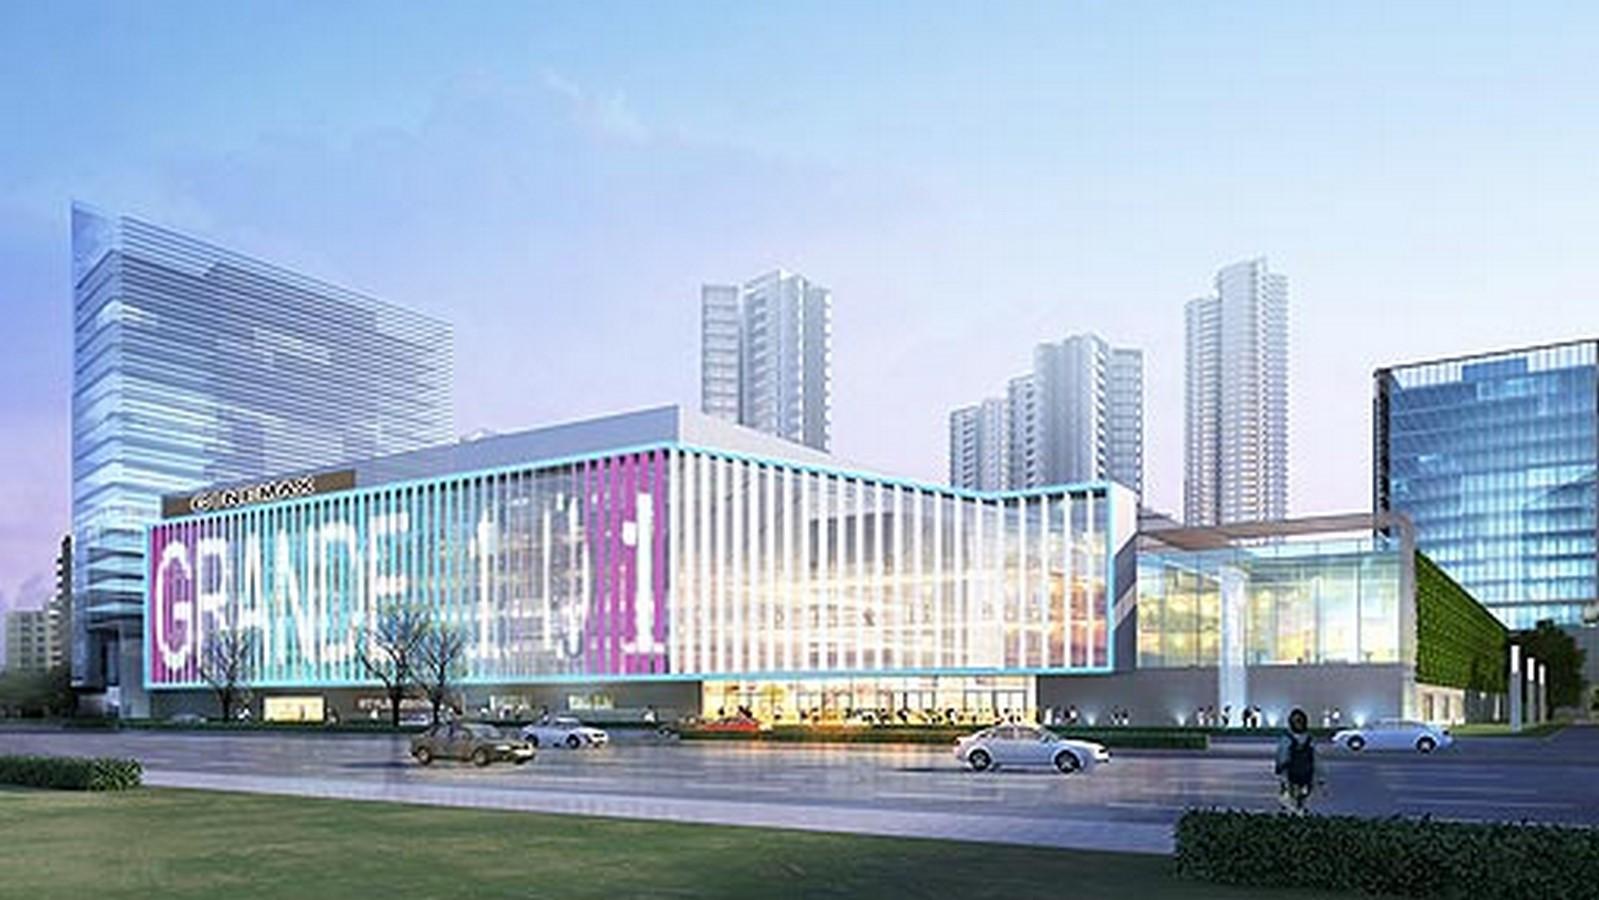 Gensler- 10 Cities & Urban Design Projects Sheet18